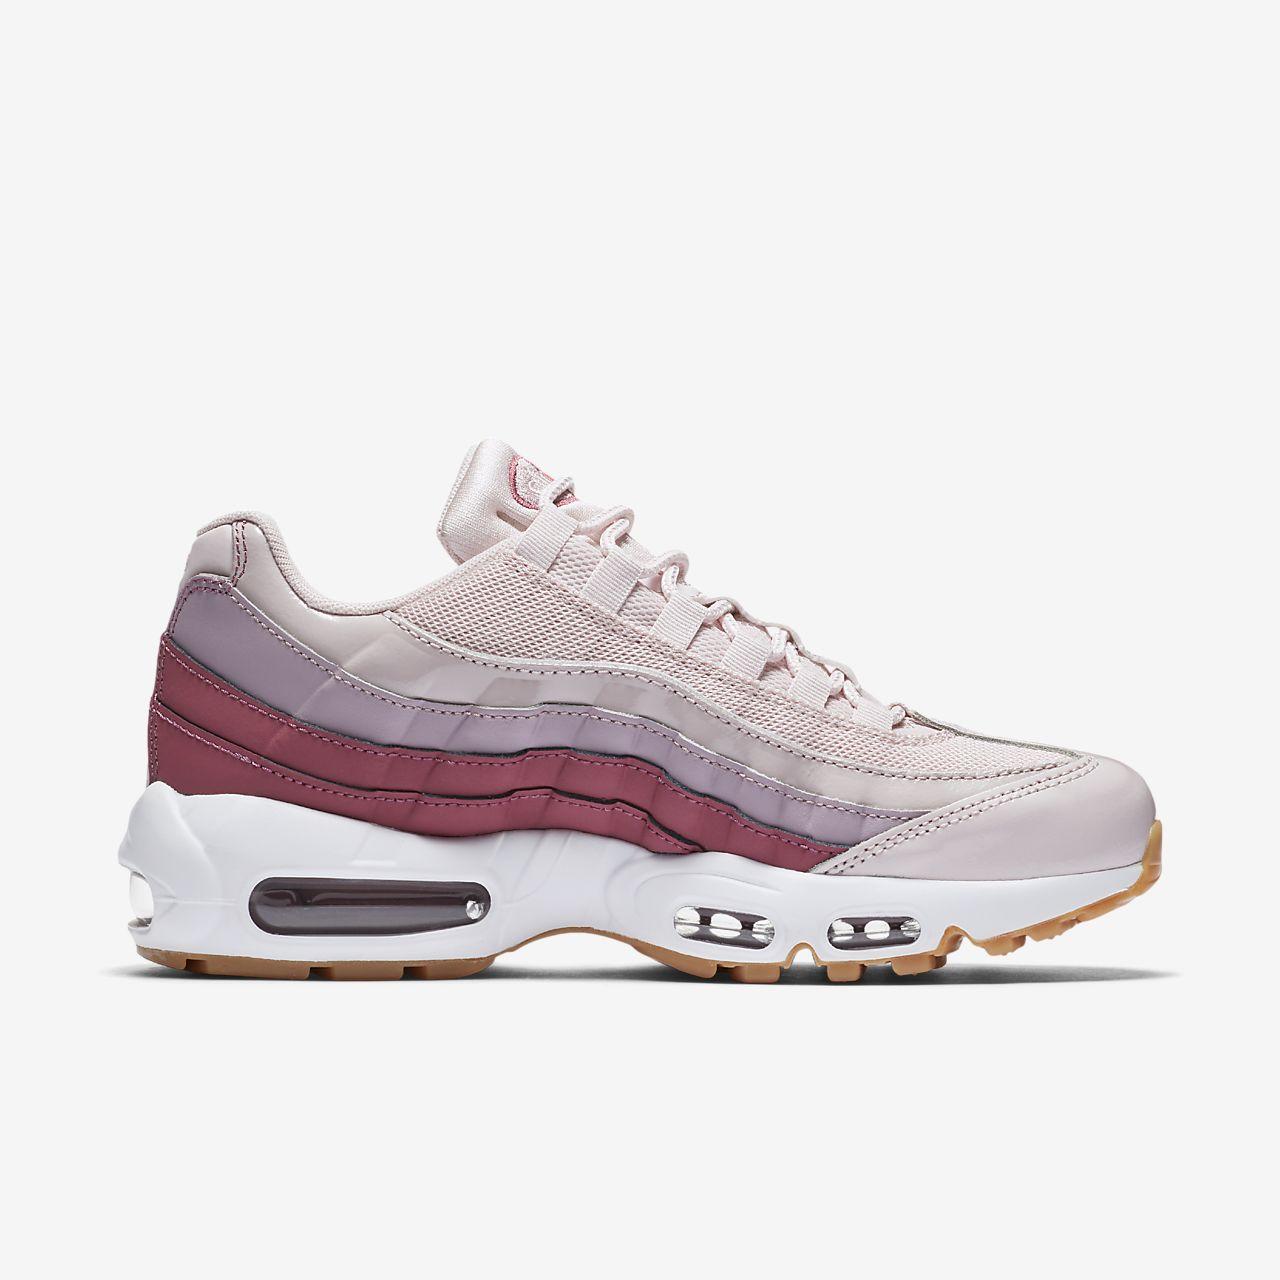 Chaussures Nike Air Jordan rose bonbon fille 38 Rose QIN&X Women's Round Toe Talons Talon Bloc Long. Chaussures 7L3fWbk8E